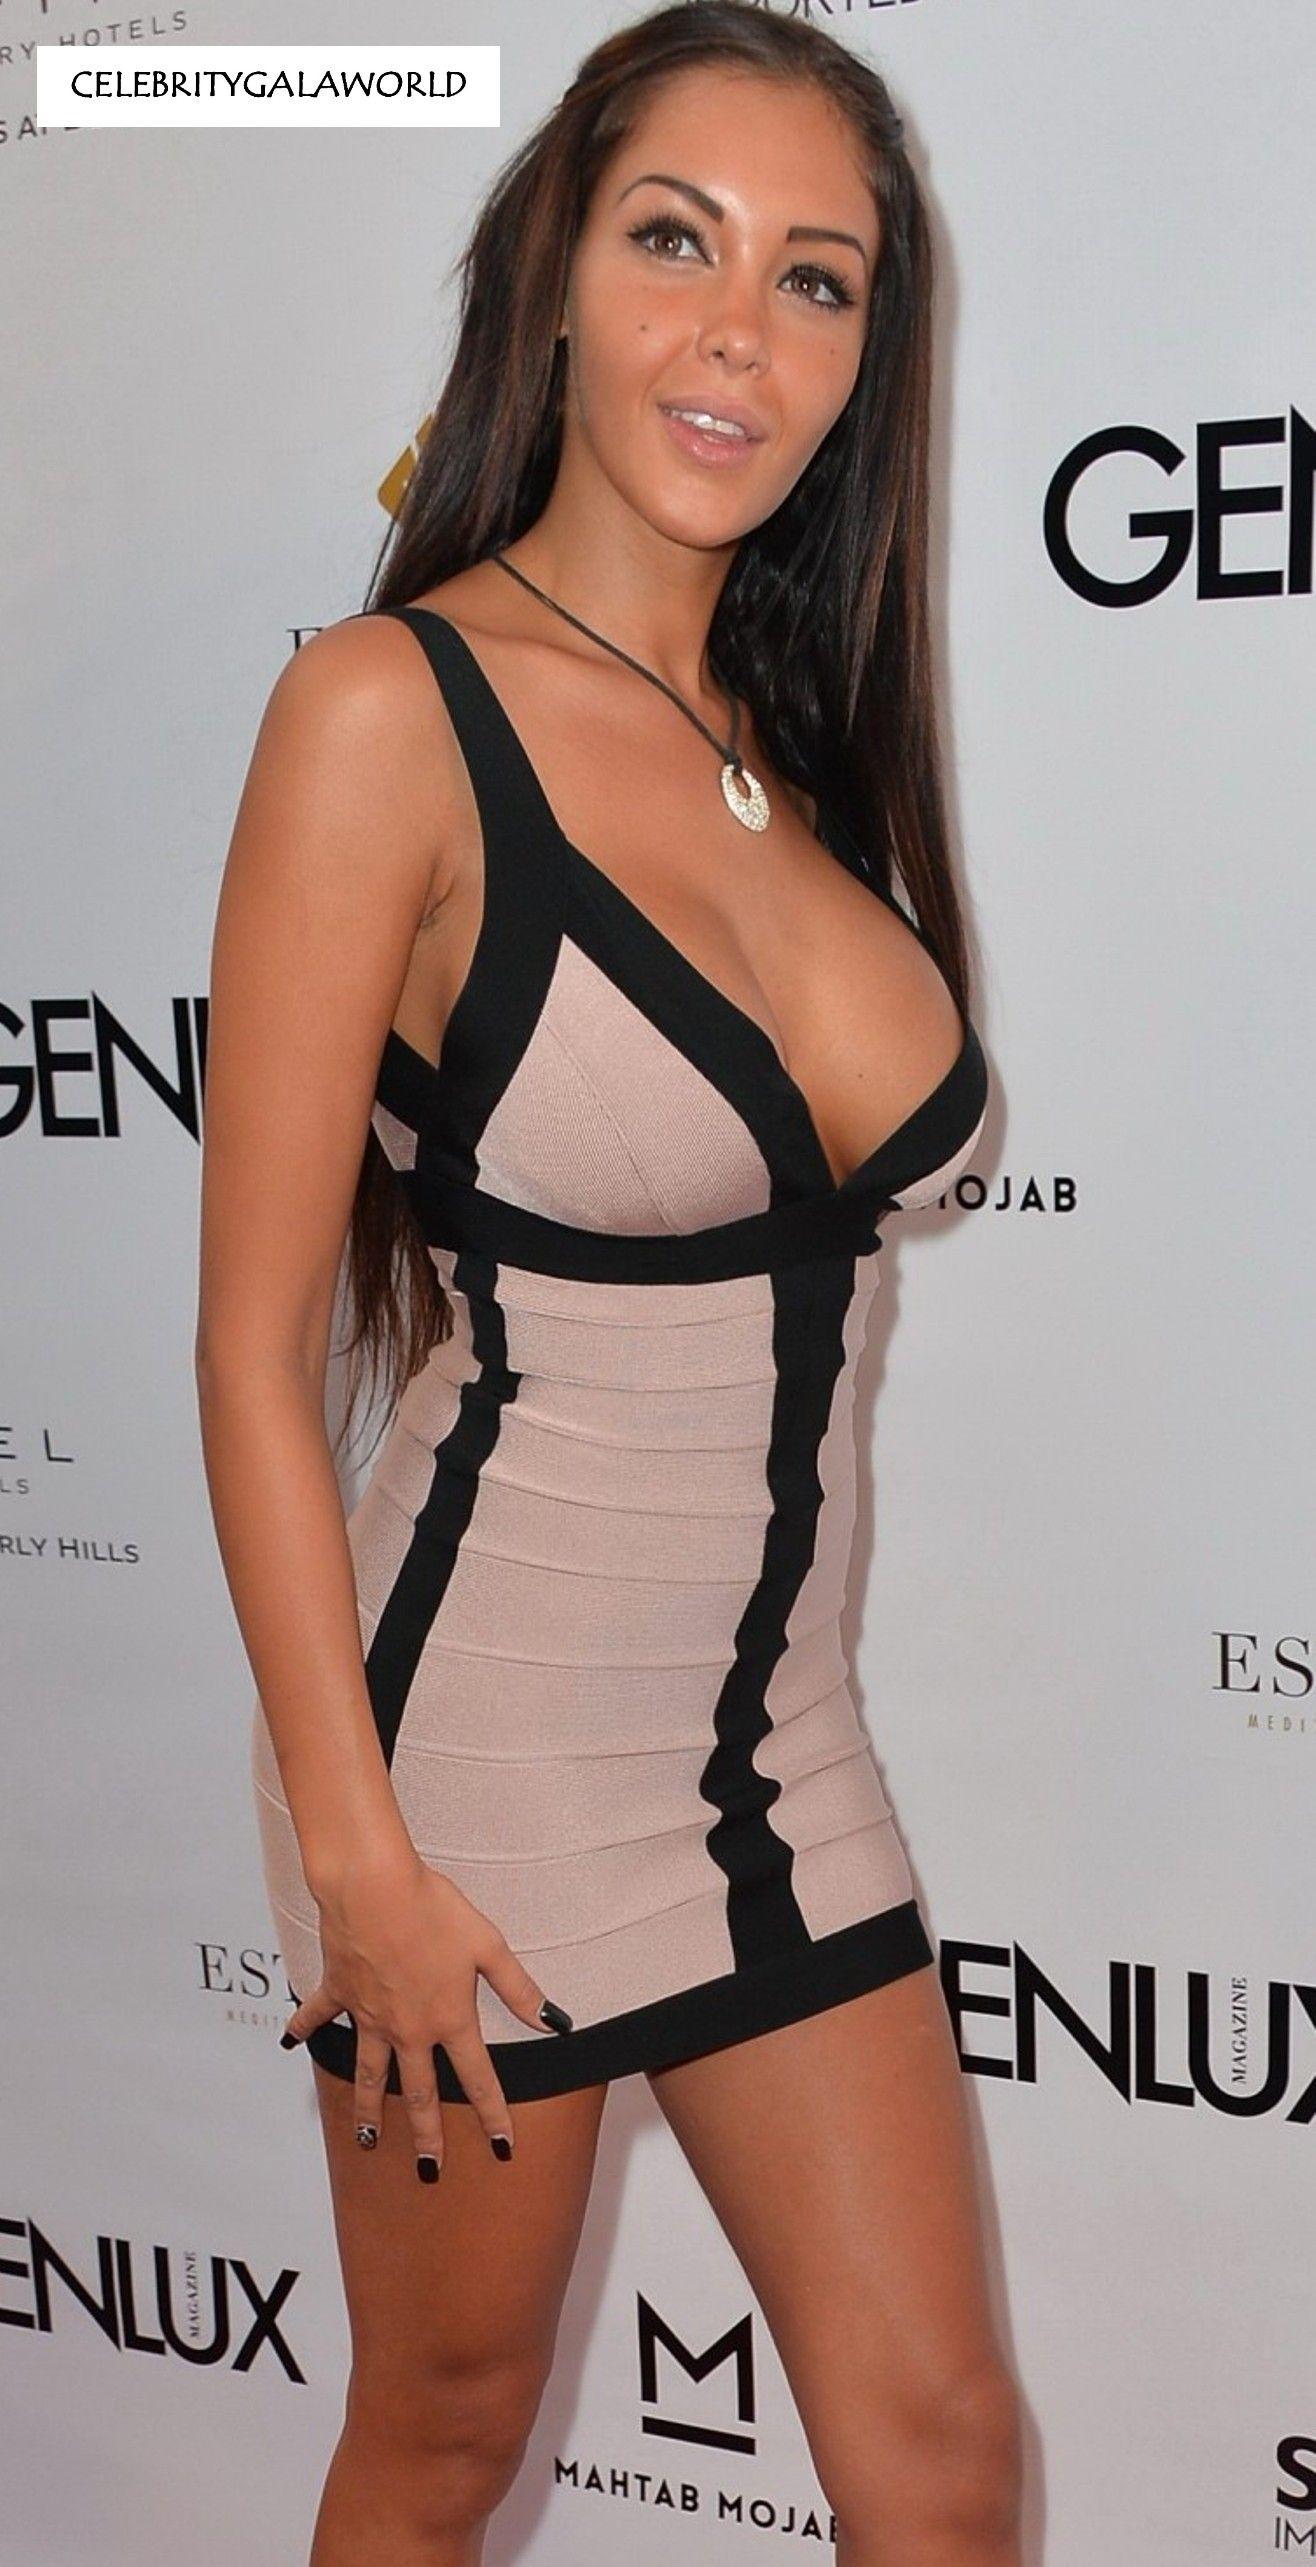 Celebrity Nabilla Benattia nudes (42 photo), Topless, Bikini, Selfie, see through 2020